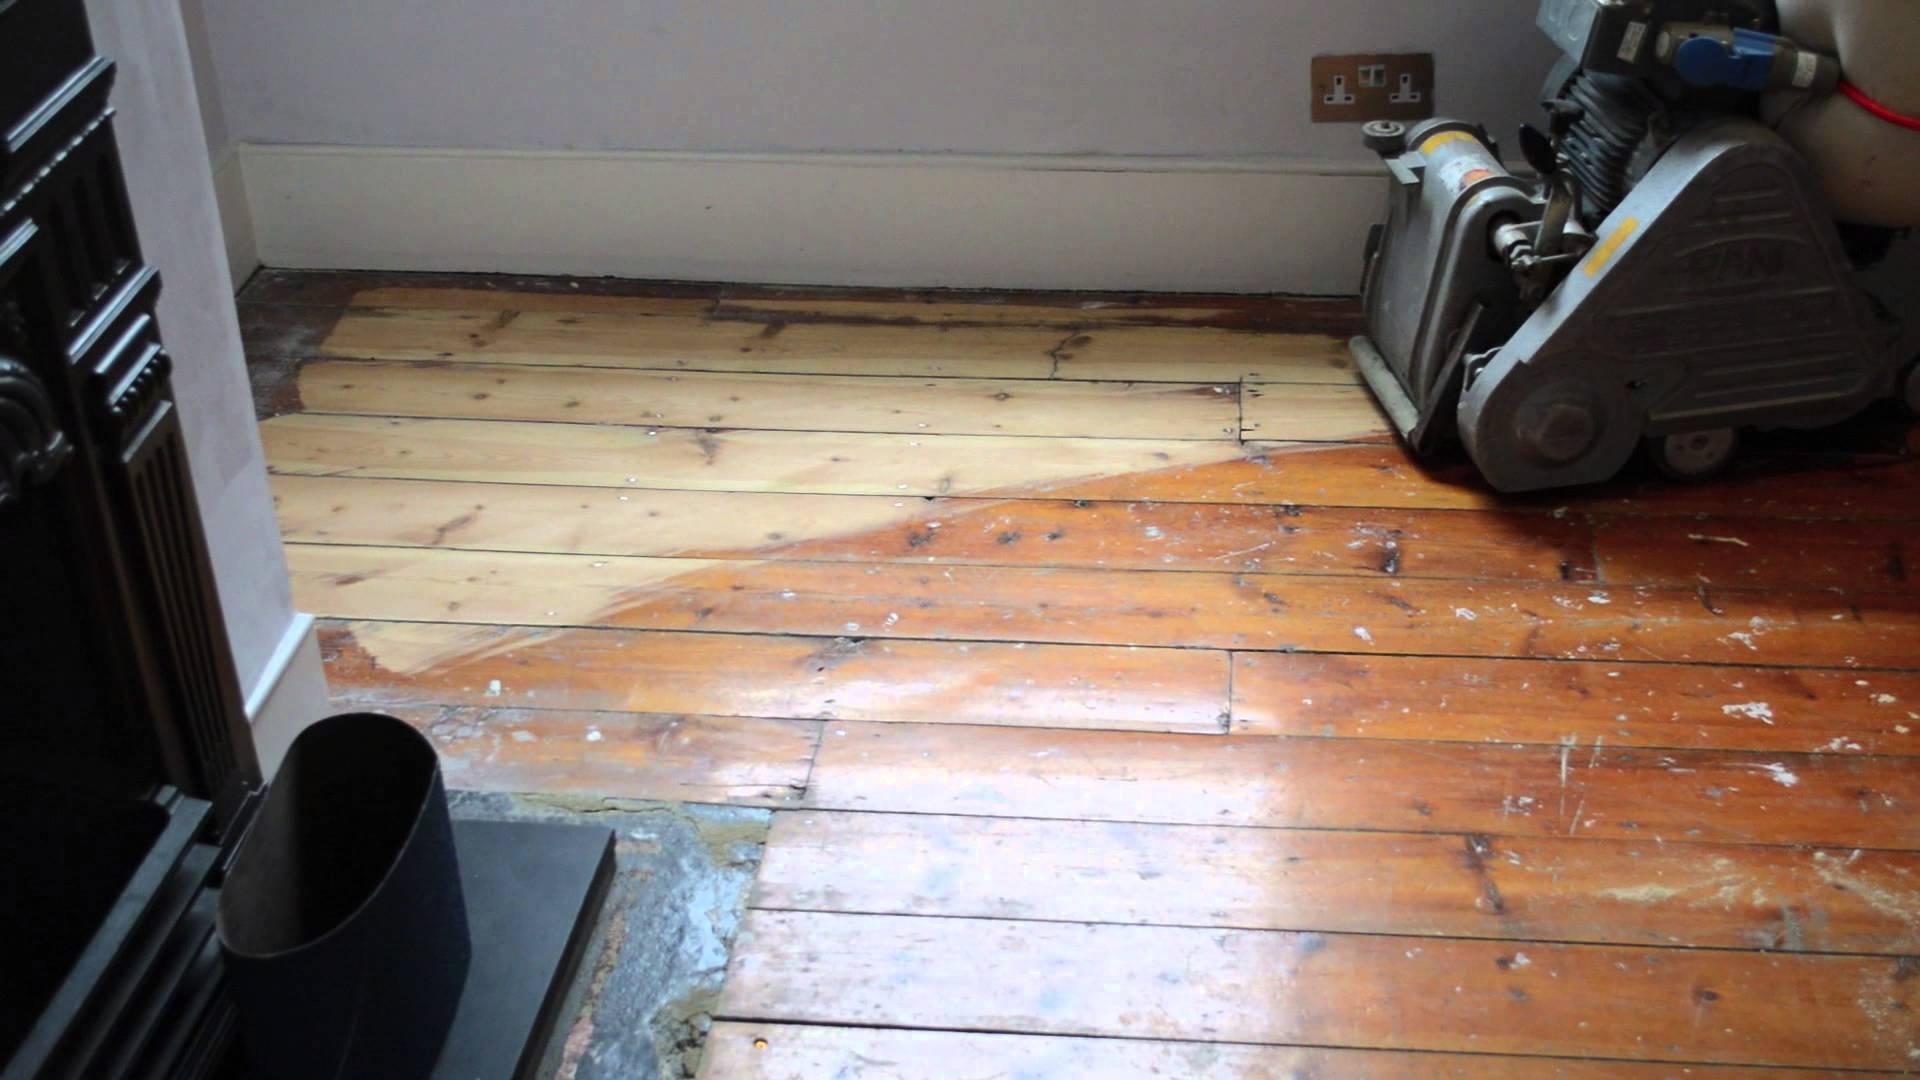 hardwood floor restore kit of luxury of diy wood floor refinishing collection throughout diy wood floor refinishing unique floor sanding with frank belt sander 24 grit belt